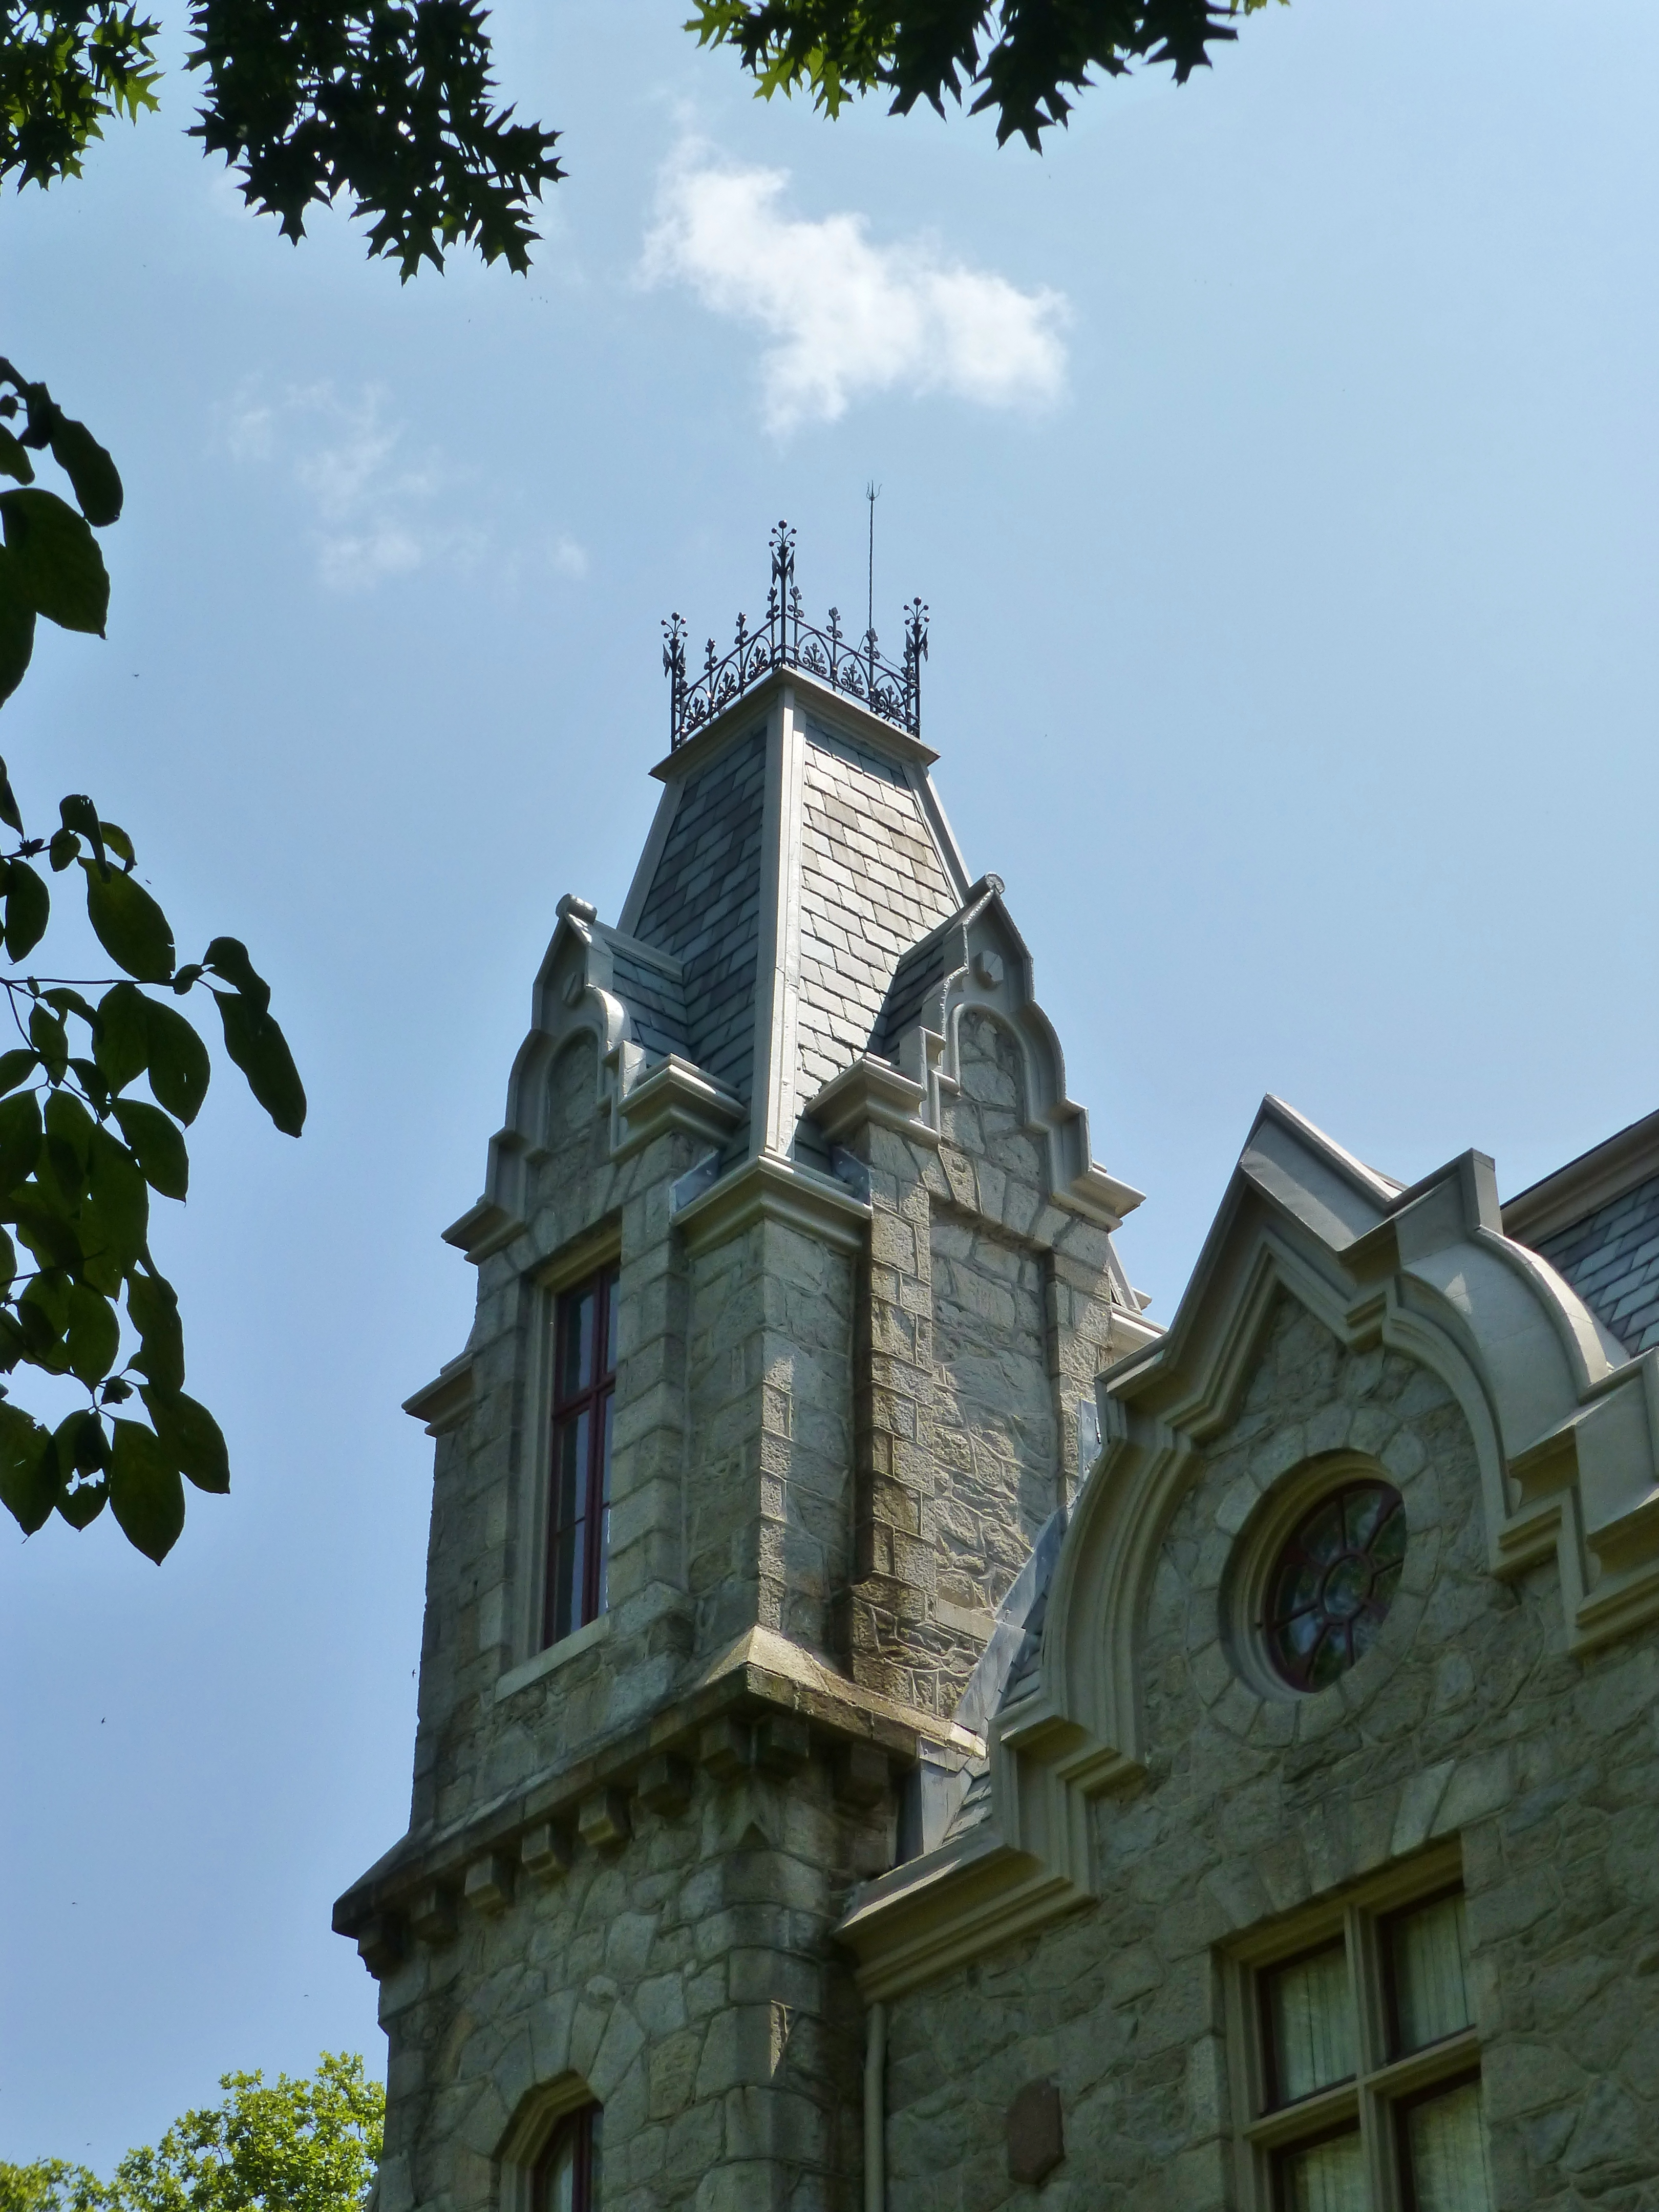 Victorian architecture ebenezer maxwell mansion kristine robinson 39 s interiors and so much more for Victorian woodwork